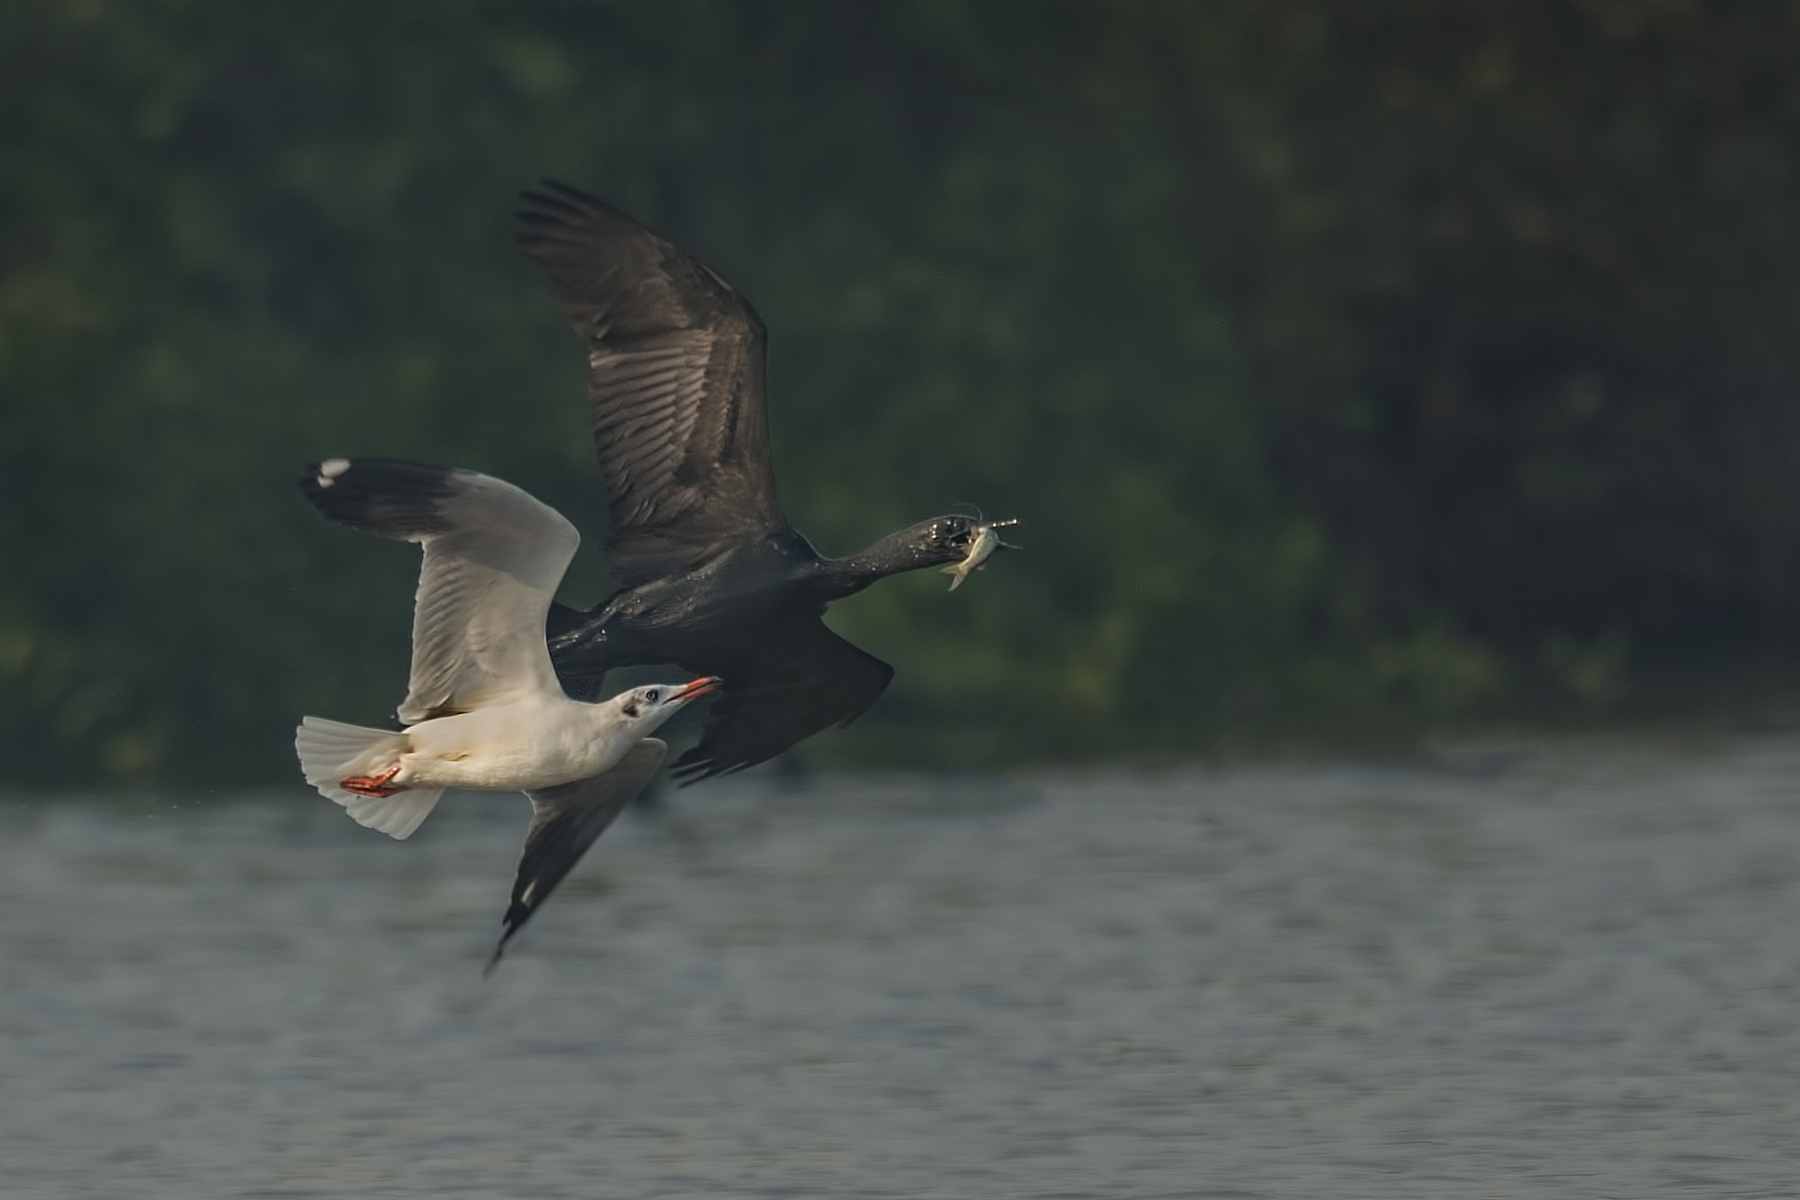 Brown-headed Seagull V/s Cormorant